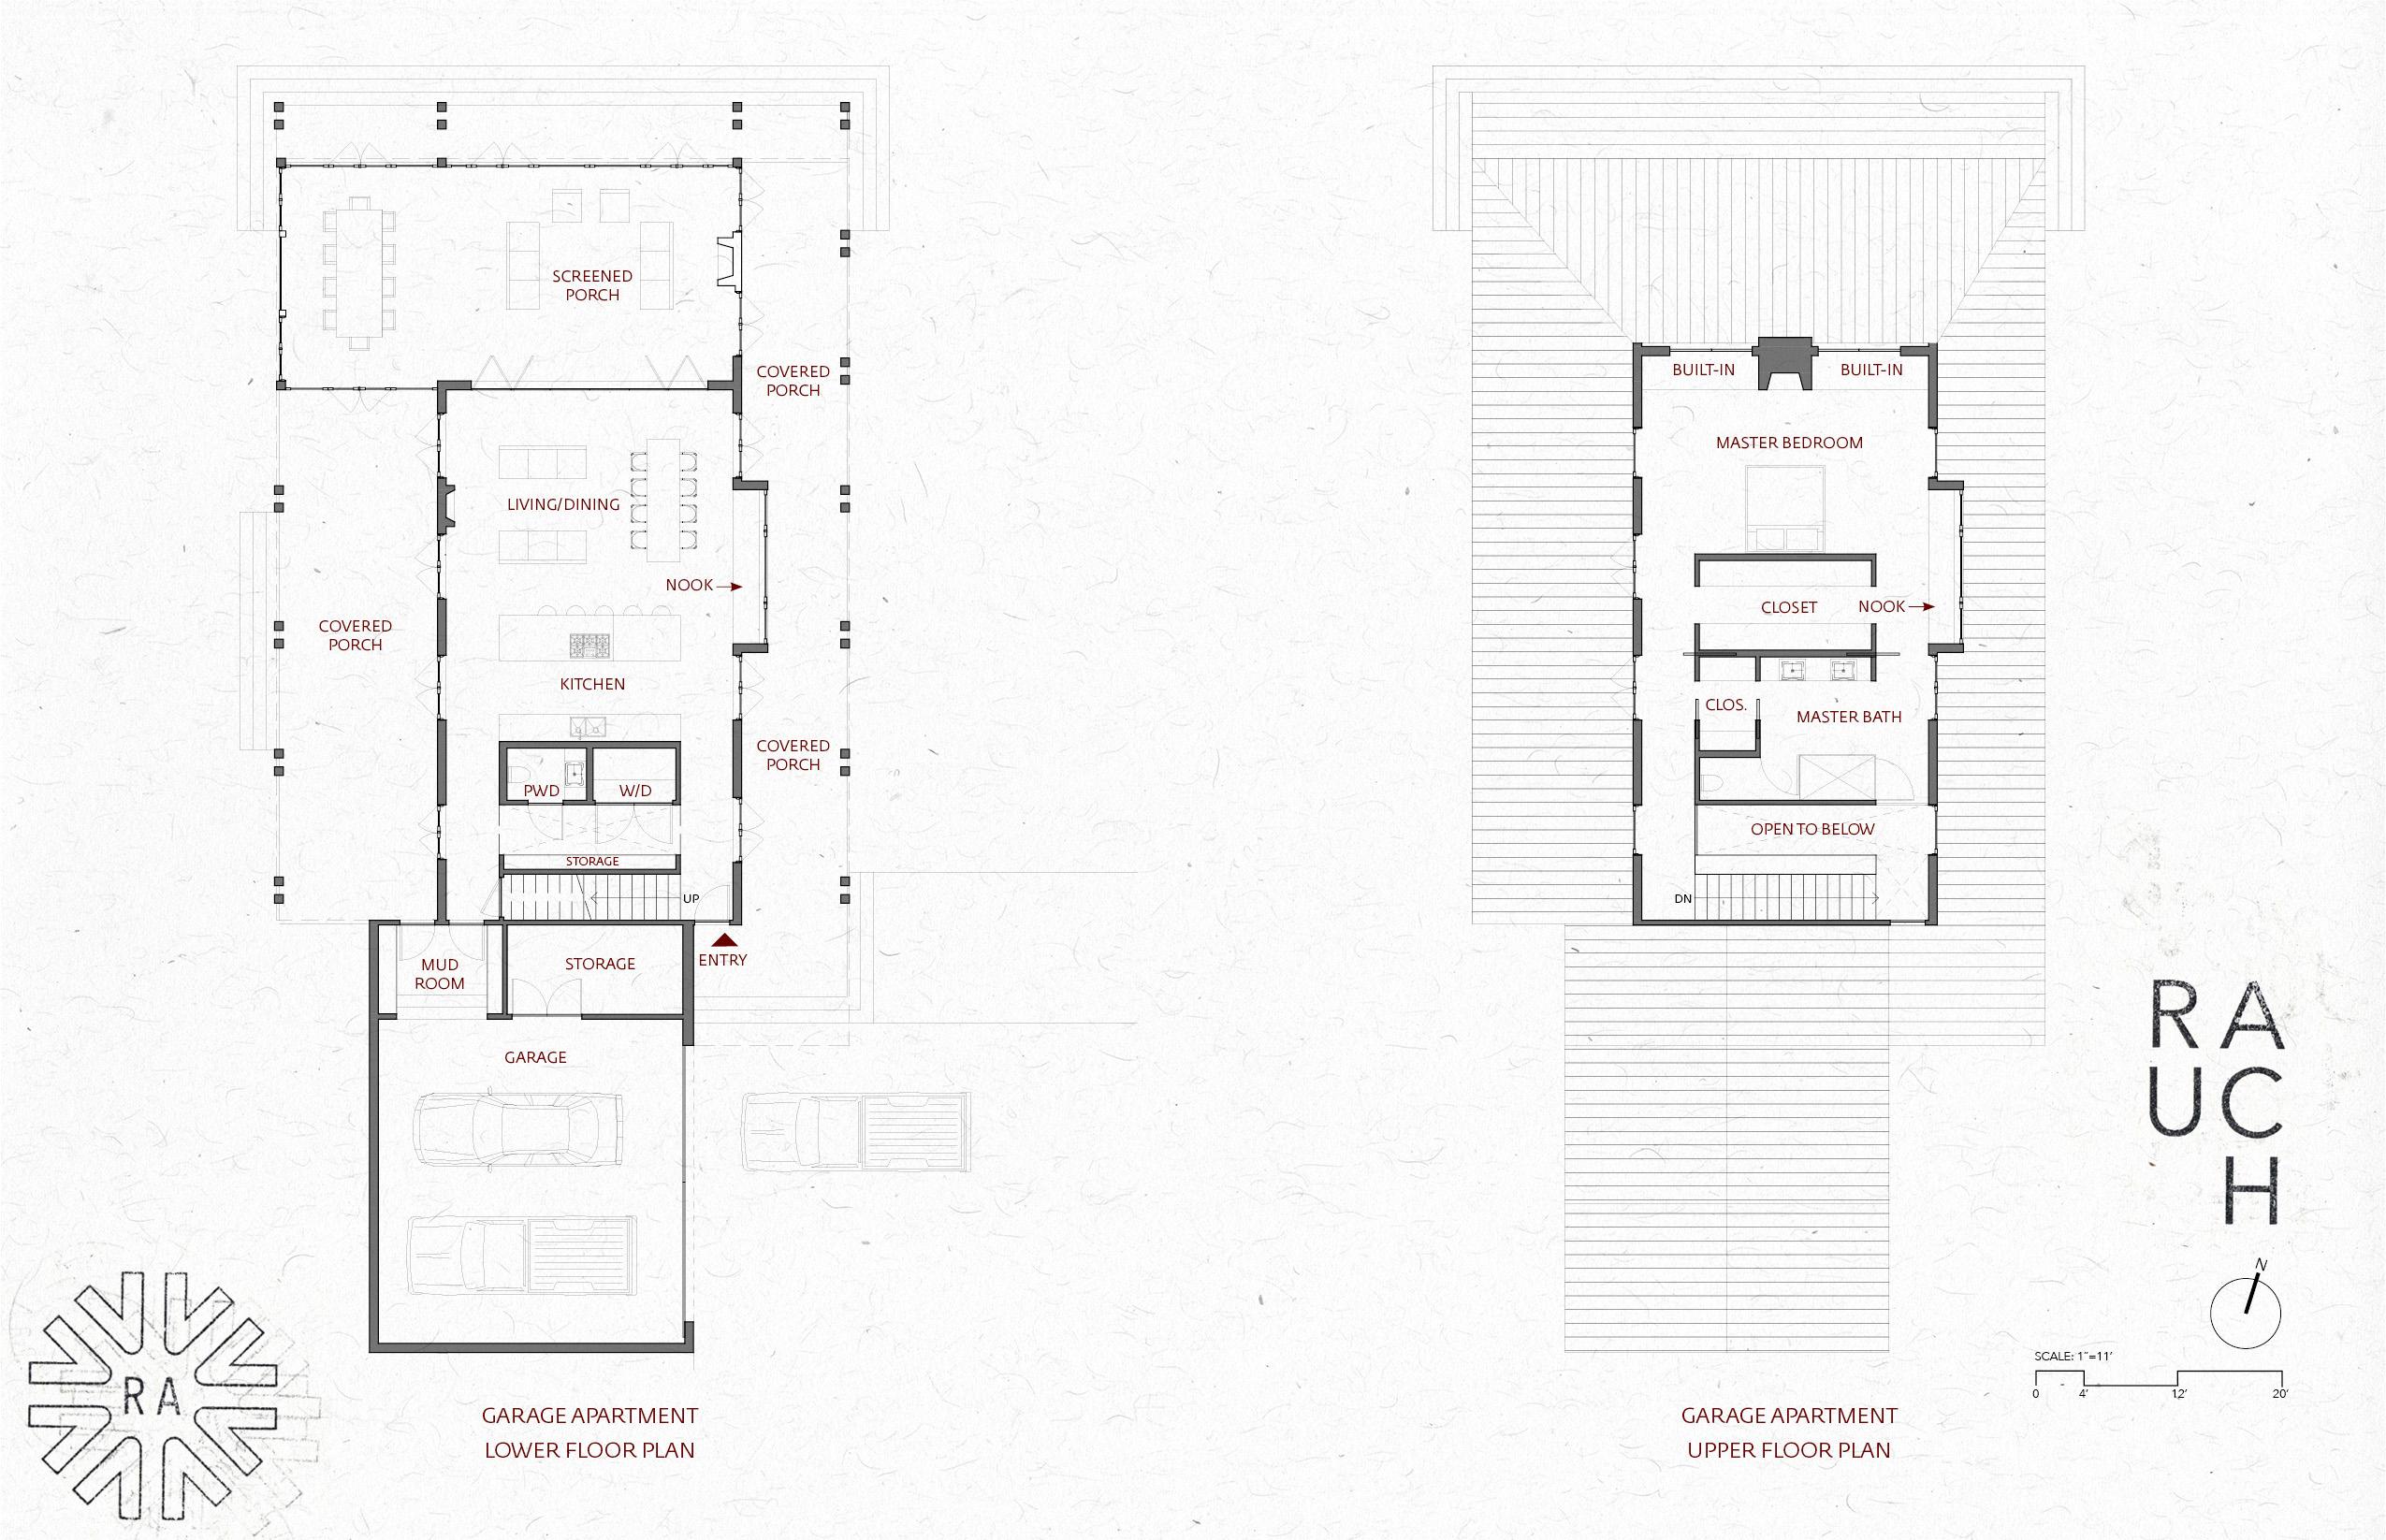 Wondrous Guest House Plans Rauch Architecture Pllc Download Free Architecture Designs Scobabritishbridgeorg